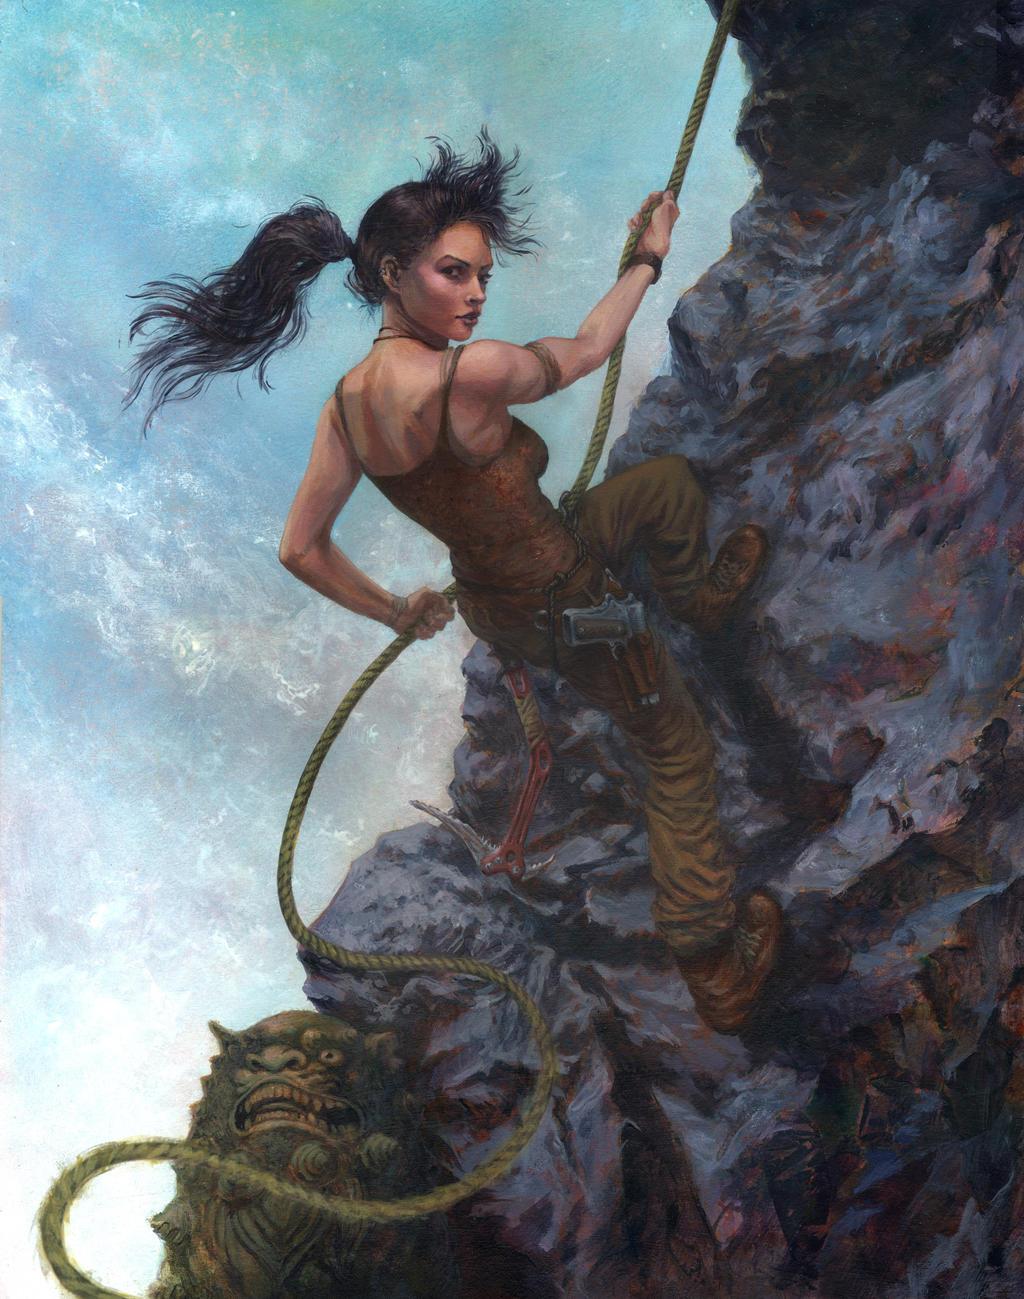 Lara by wiltekirra